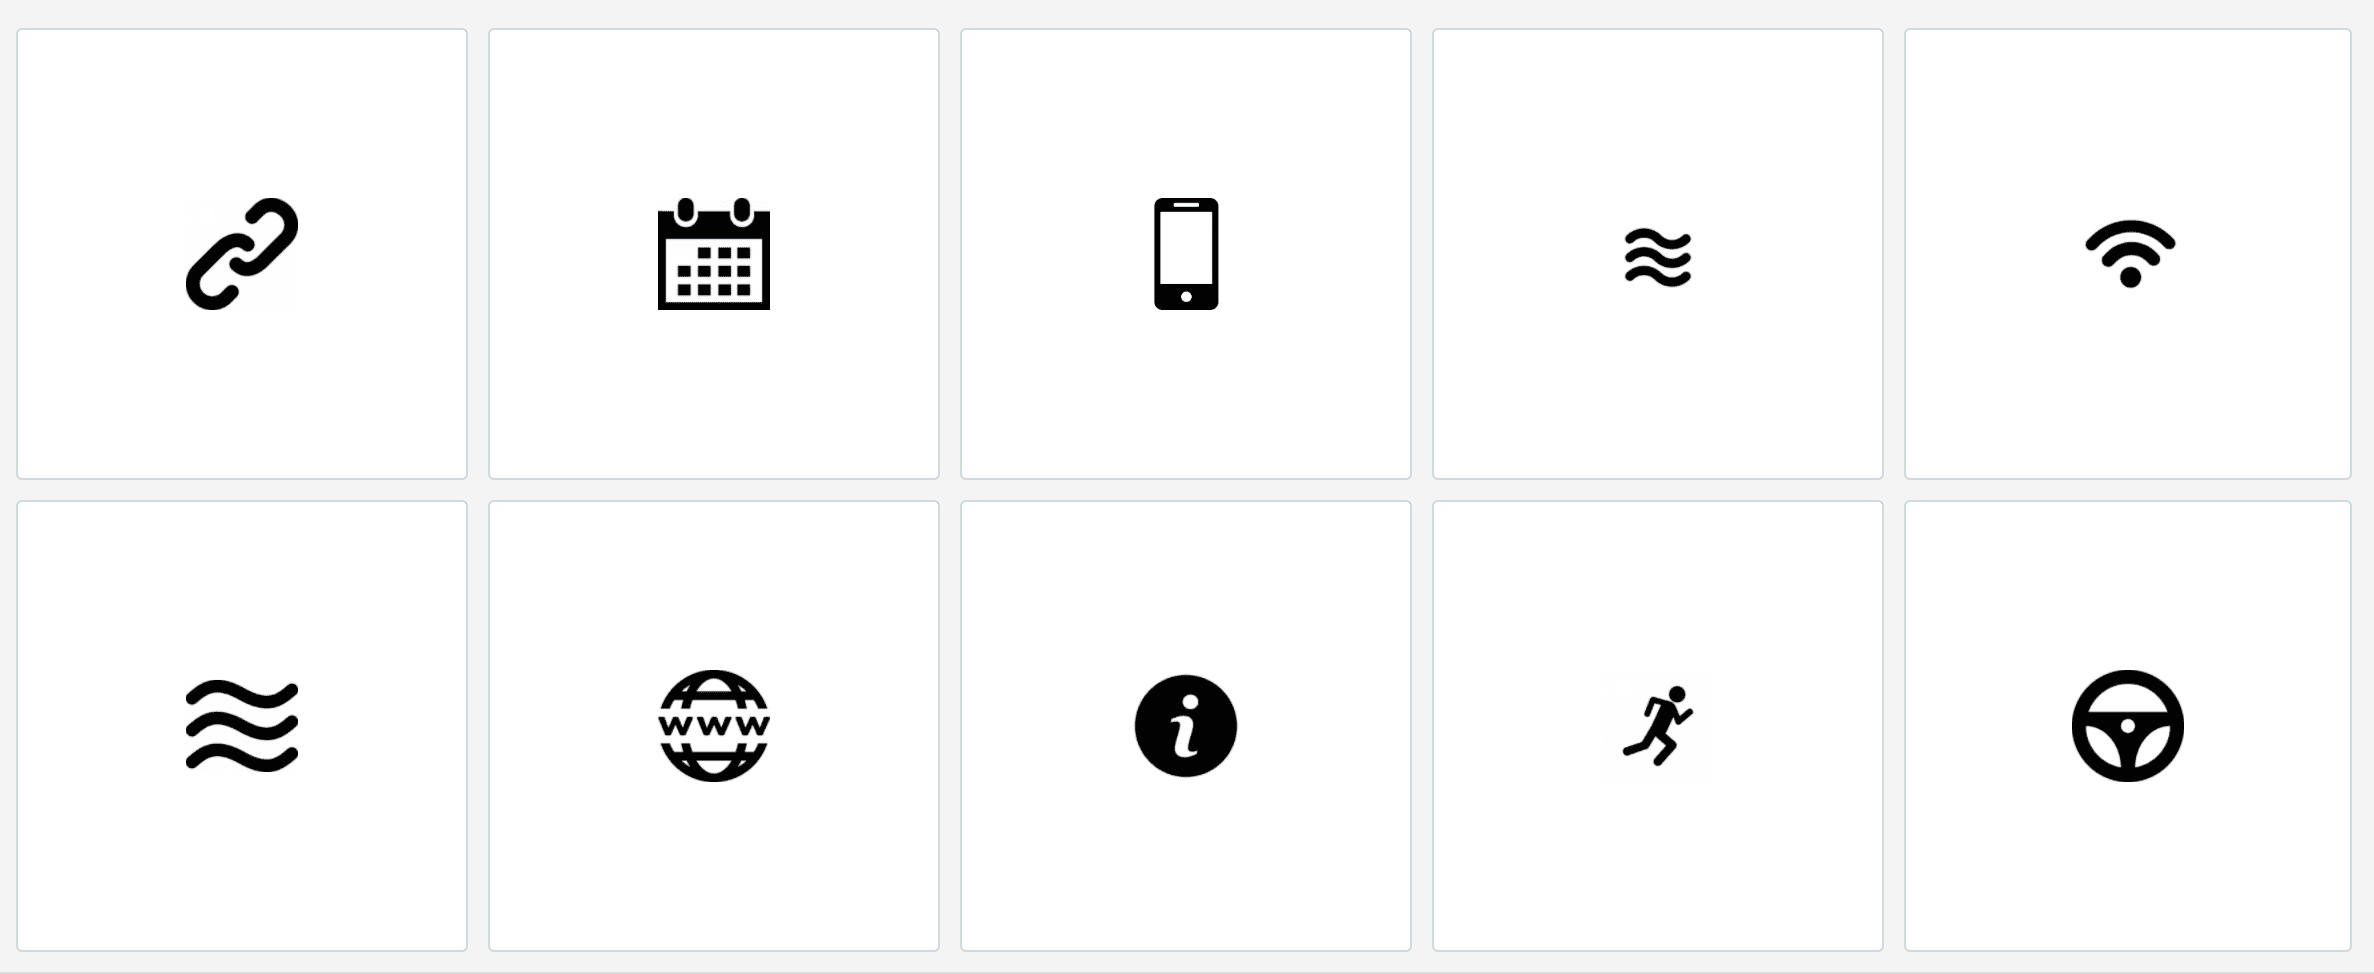 Icons from Freepik.